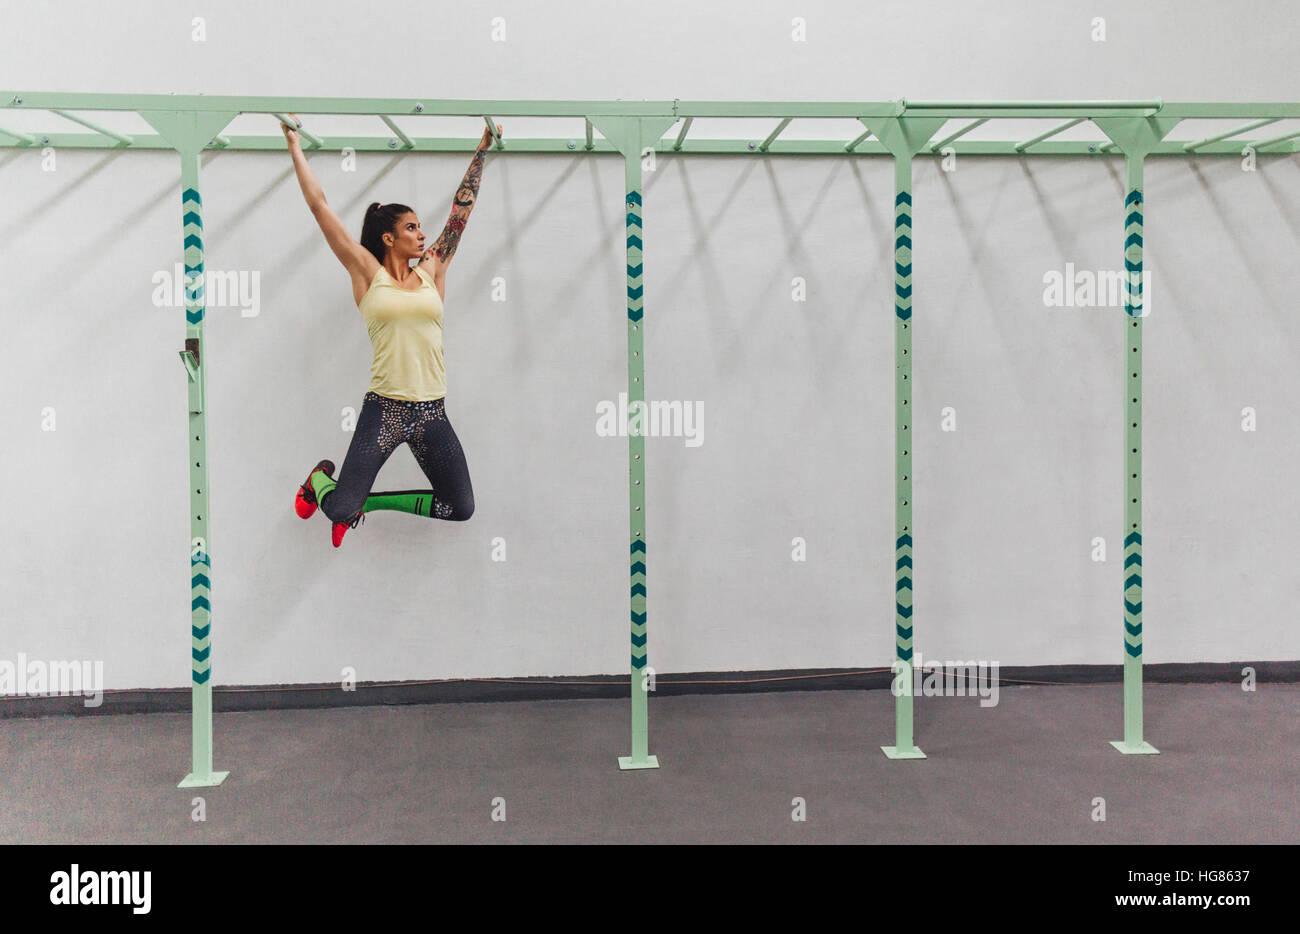 Athlete hanging on monkey bars in gym - Stock Image